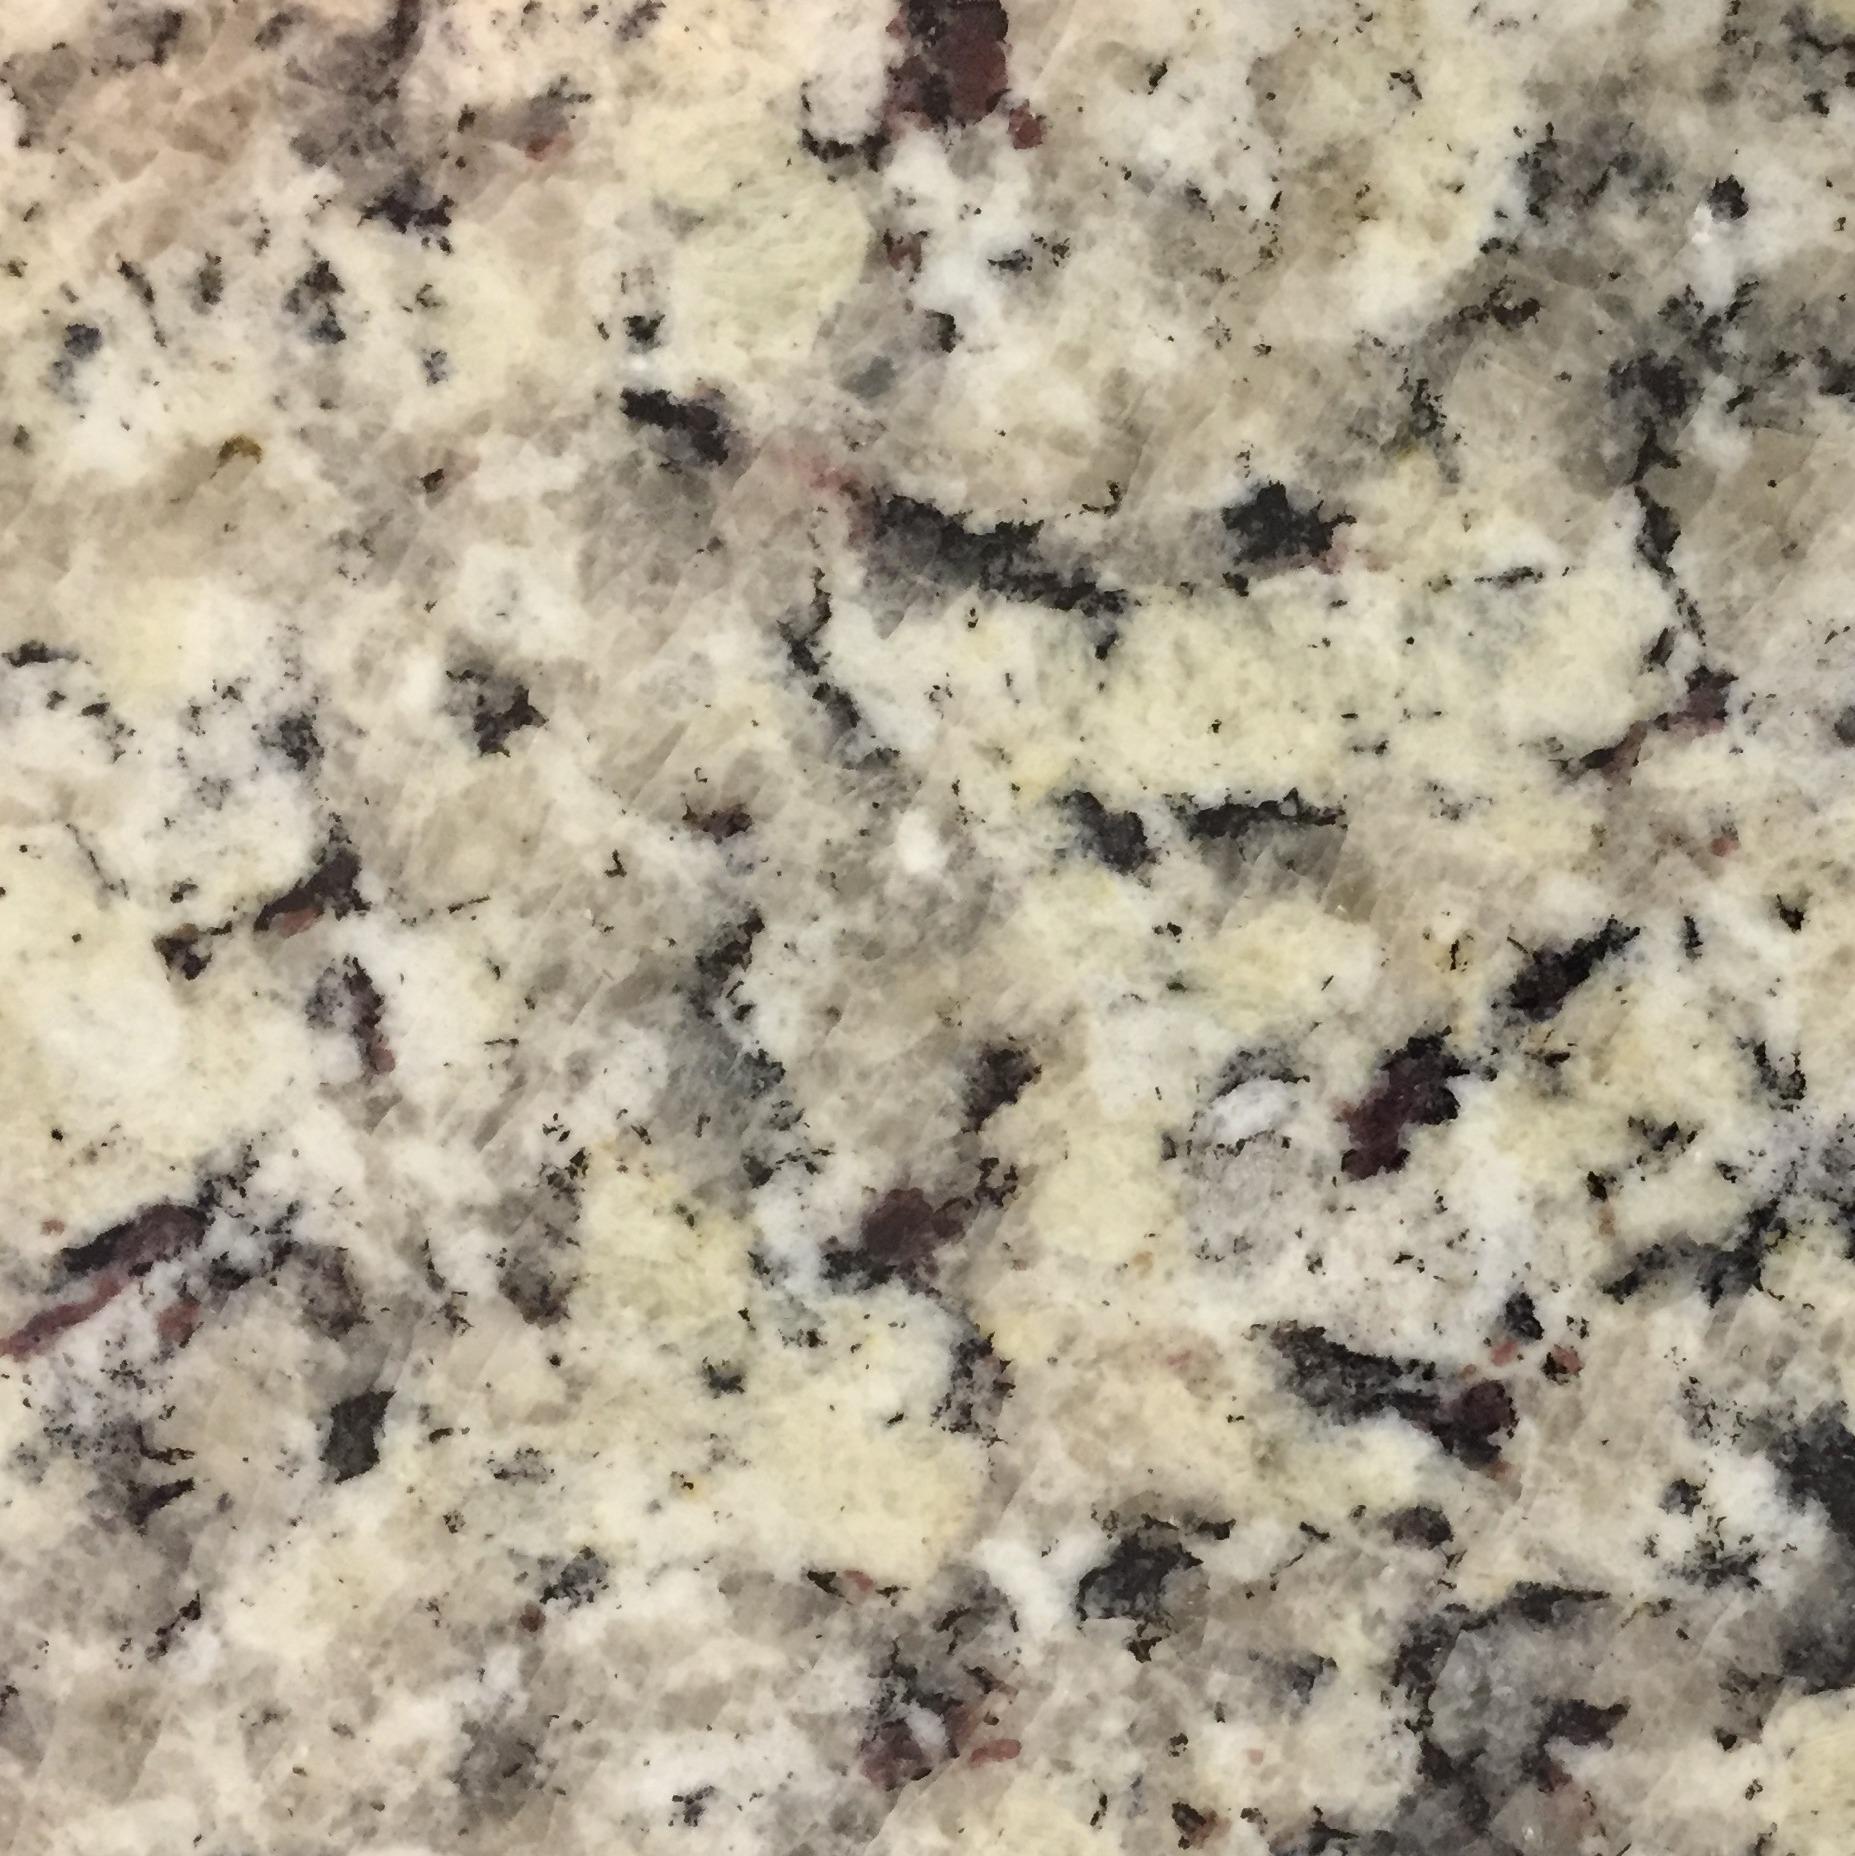 Granite Countertops Amp Surface Slabs In Wetumpka Al